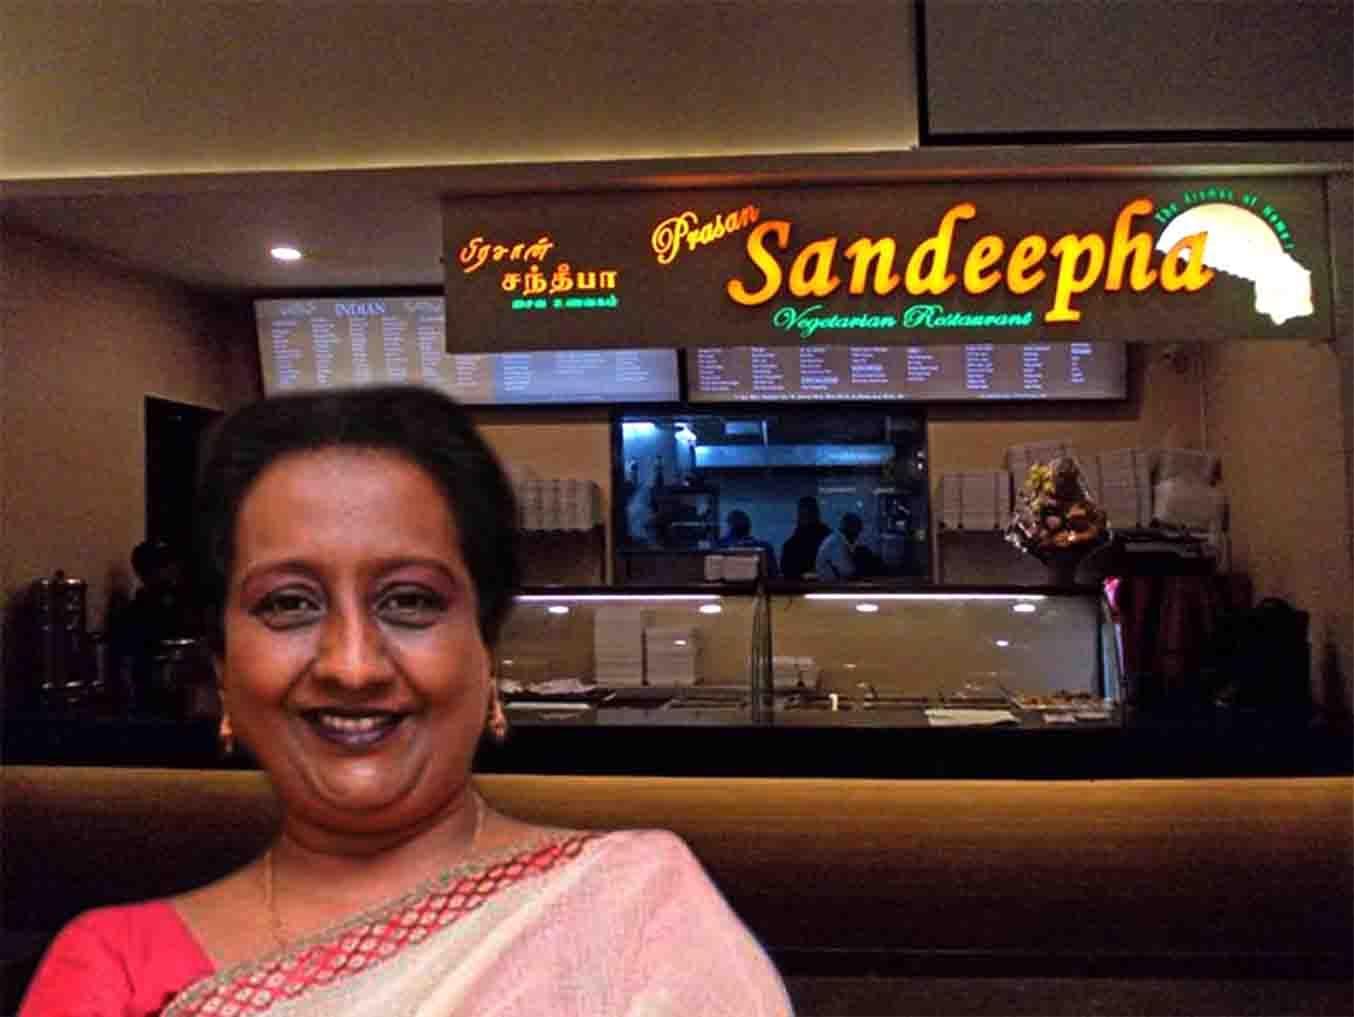 History Maker: Patricia Narayan  - Owns Chain of Restaurants